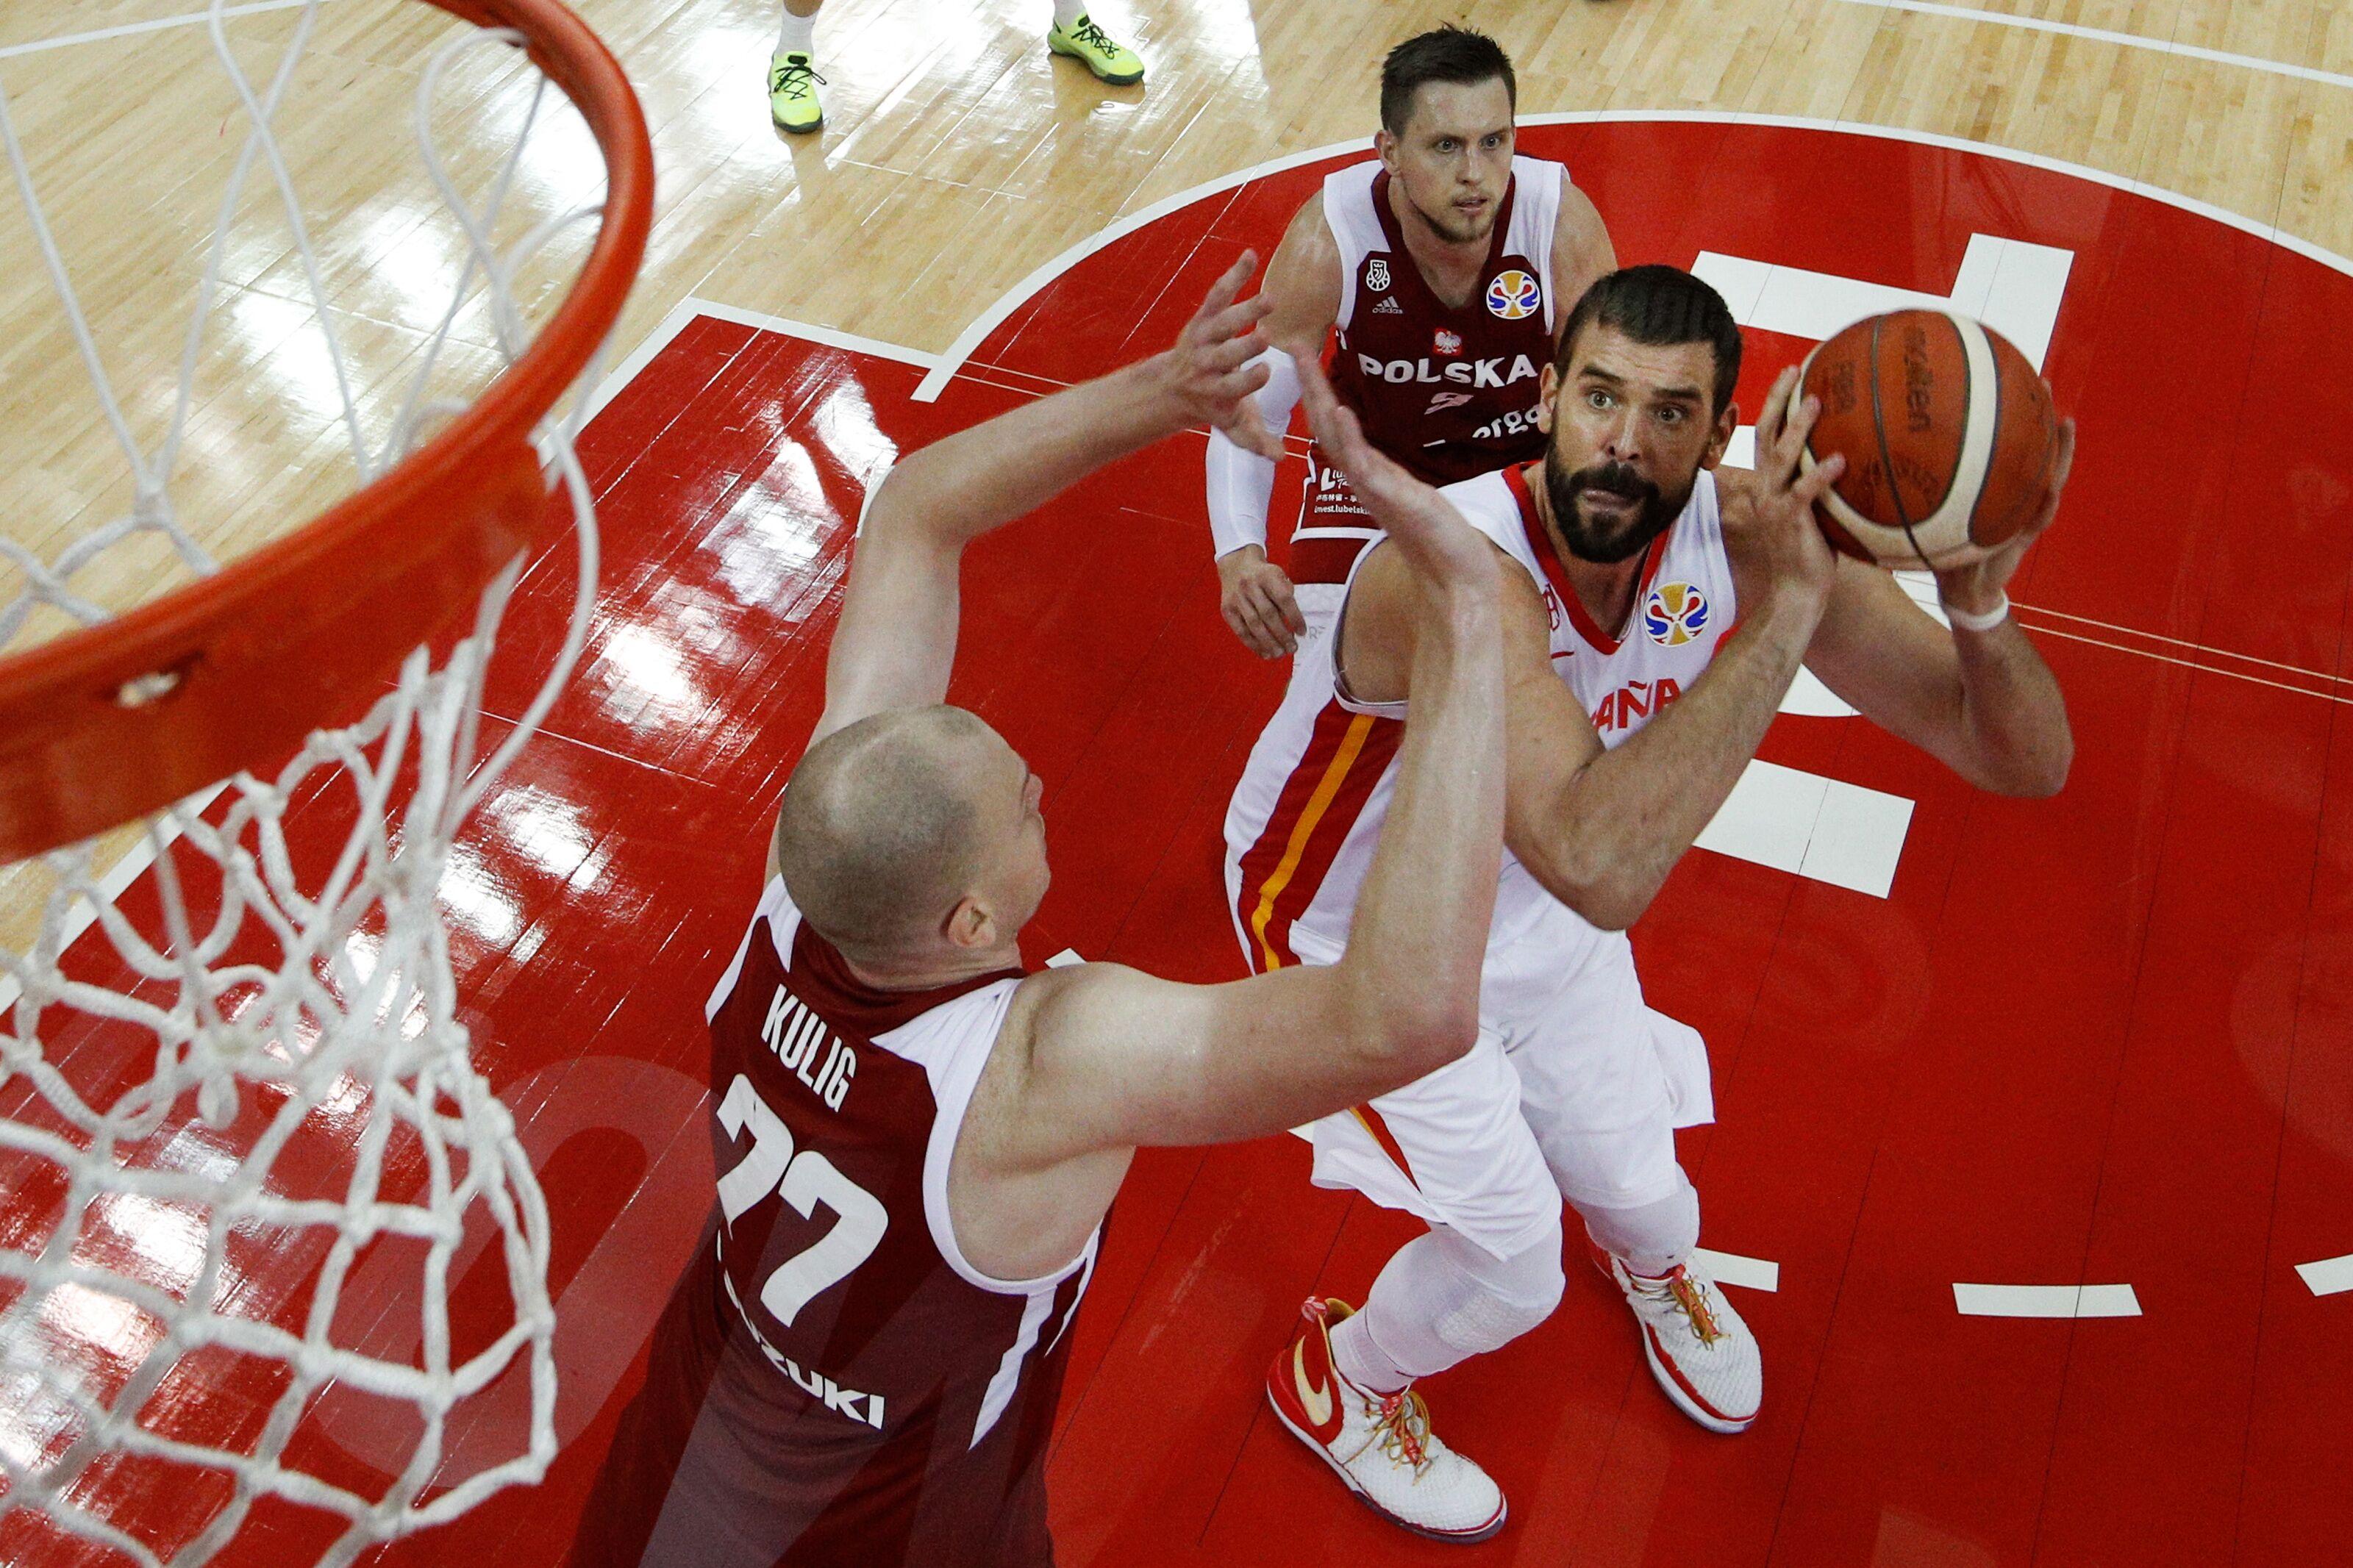 Toronto Raptors: Marc Gasol showcases different style in FIBA tournament